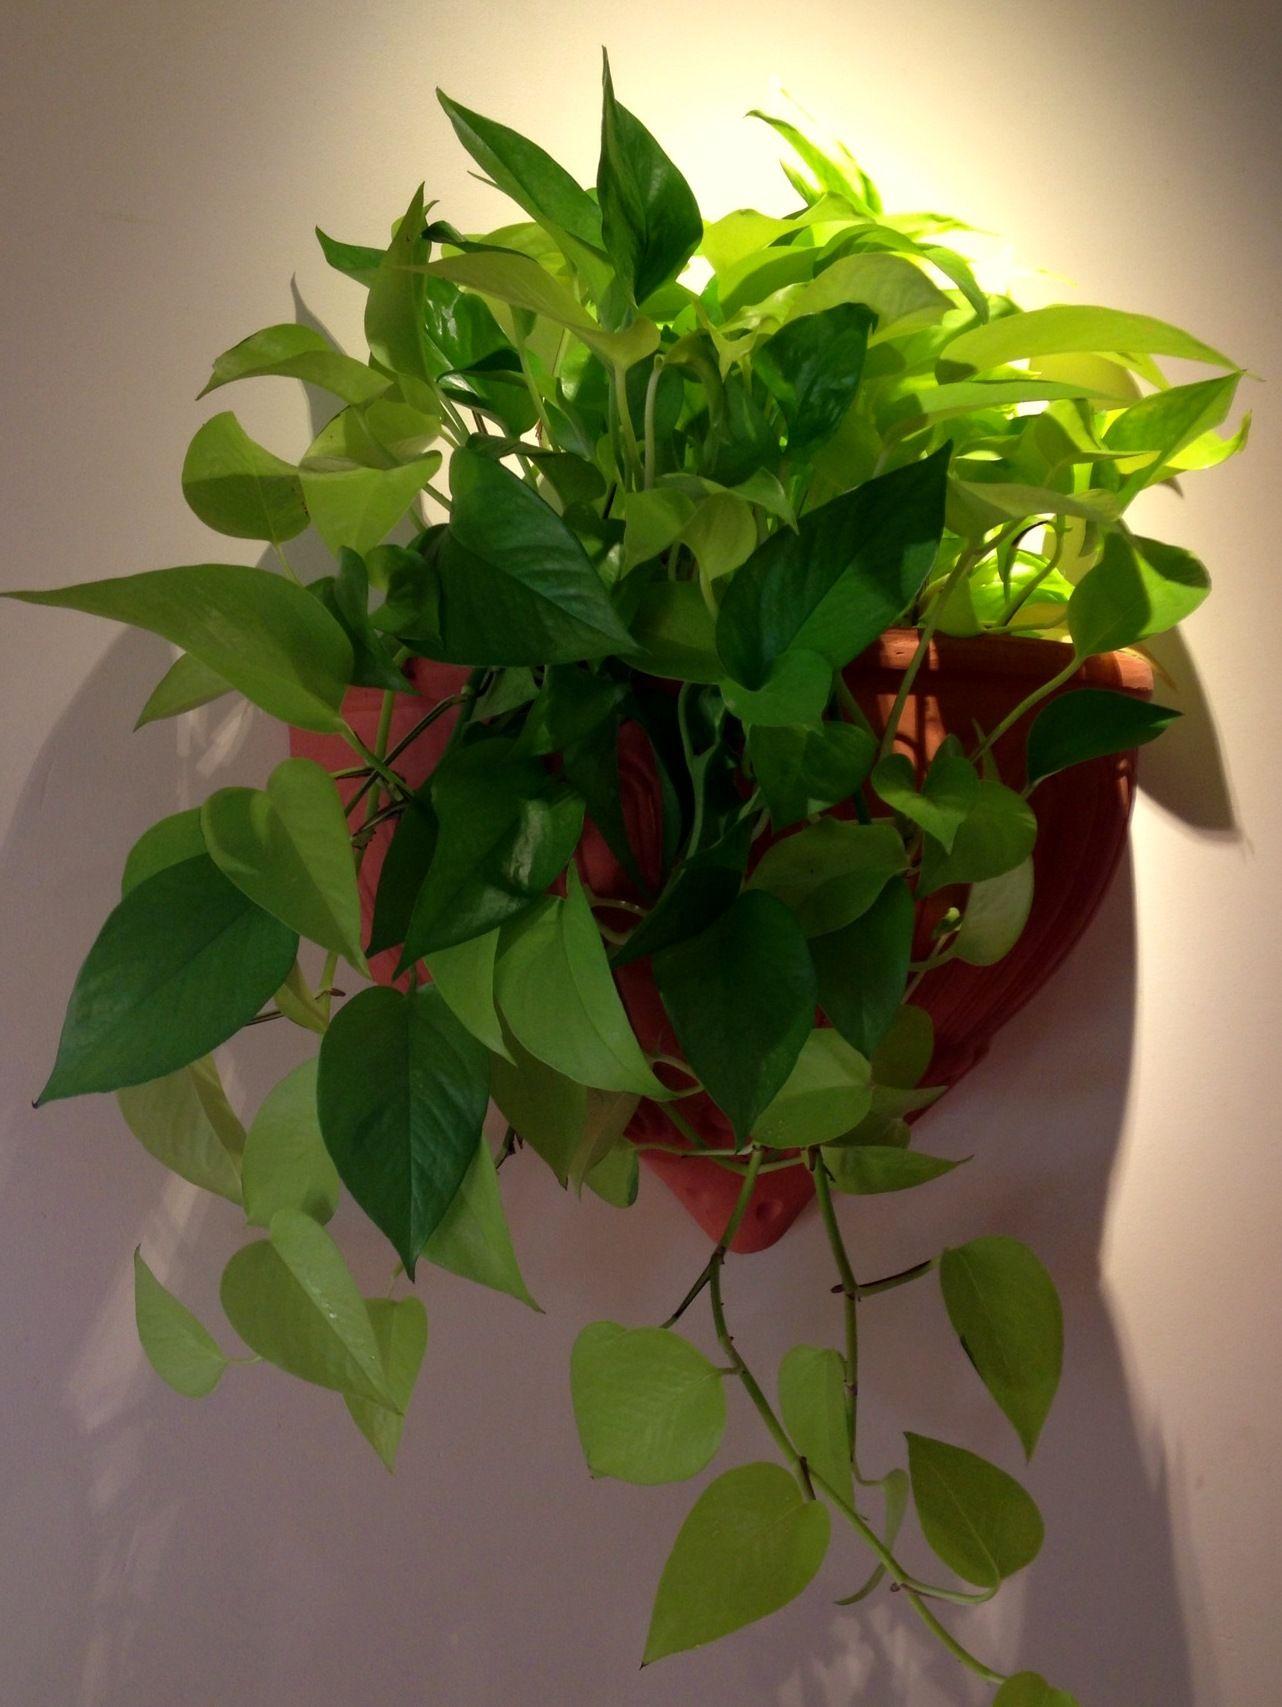 Wall Sconce With A Neon Pothos Neon Pothosplant Decorsmall Gardensindoor